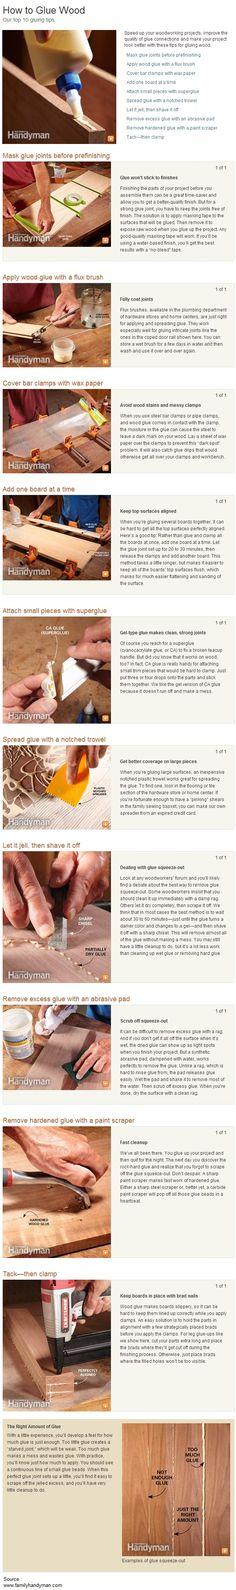 Top 10 gluing tips